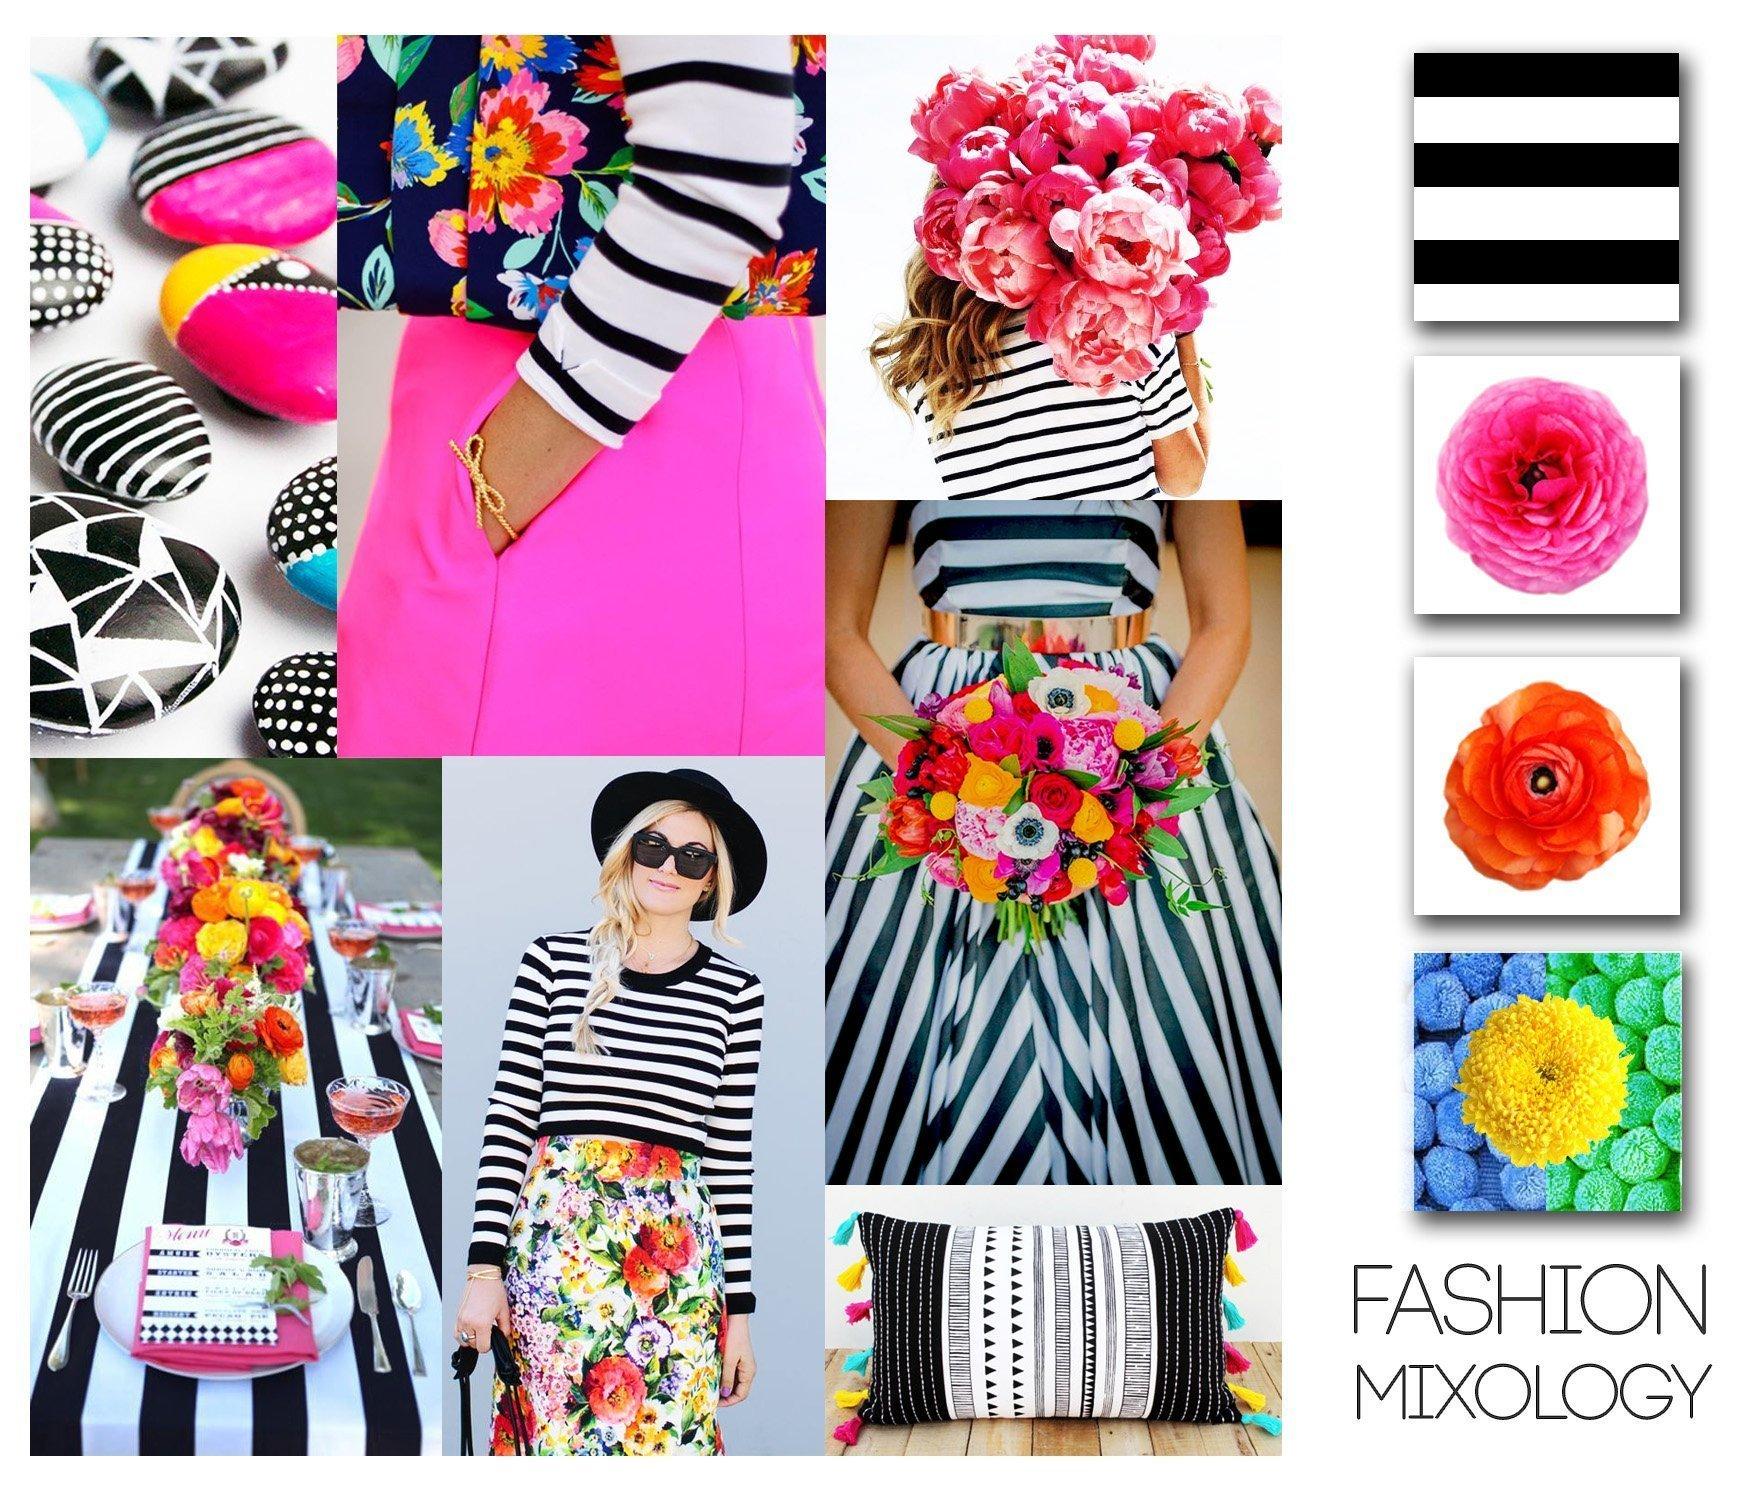 Decor Meets Fashion - Mixing Prints: Desaturated Stripes & Bright Florals 10